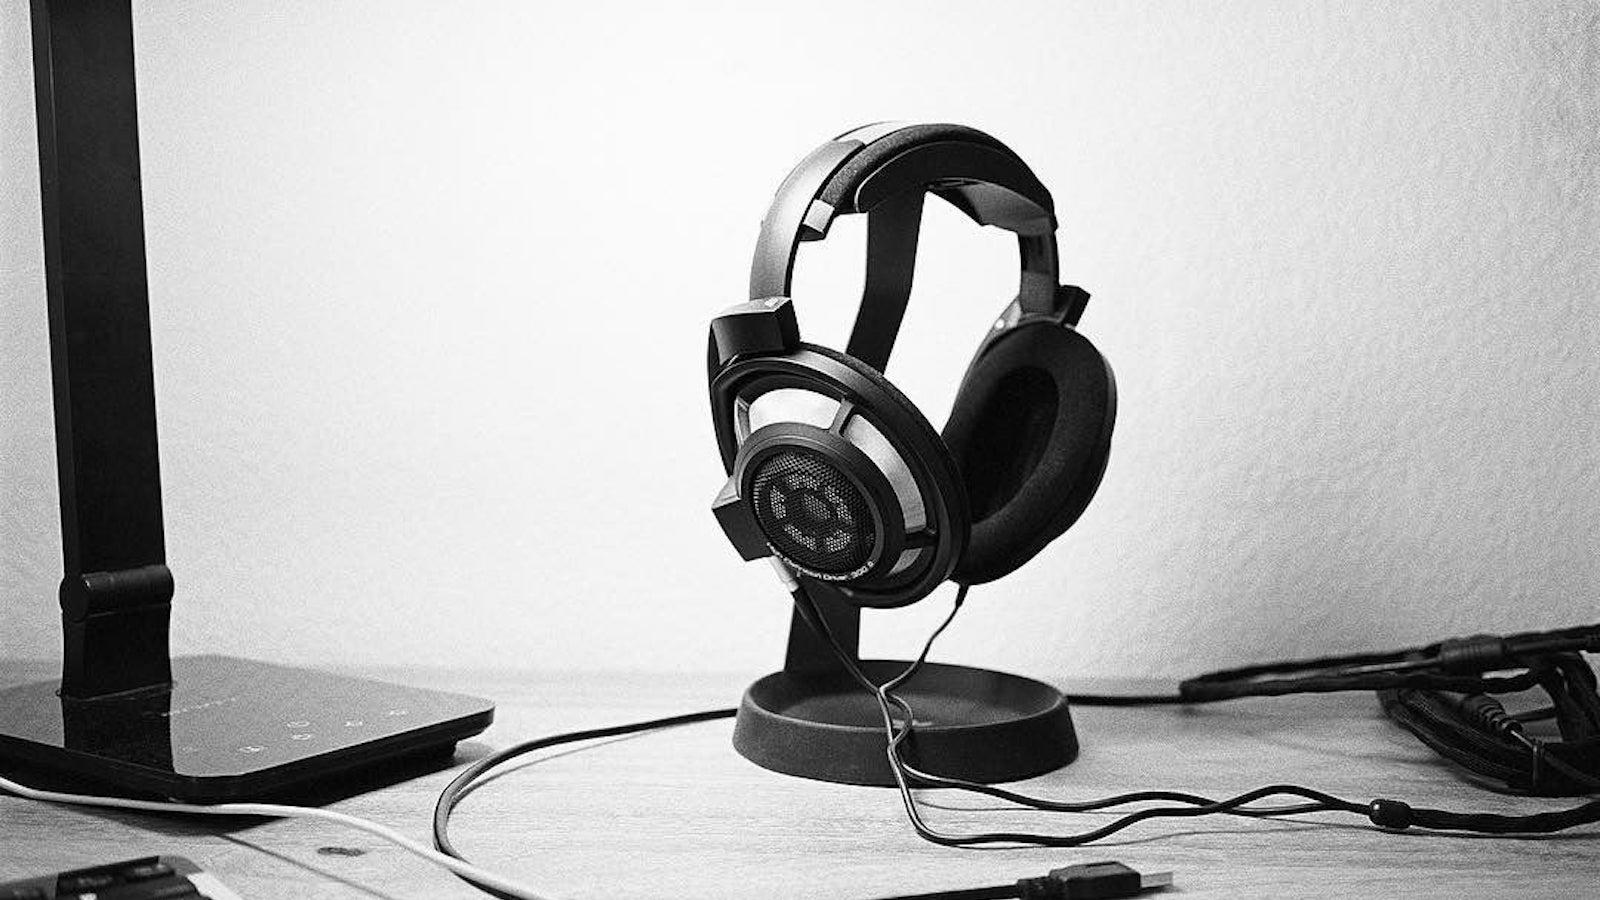 Sennheiser HD 800 S Anniversary Edition Headphones